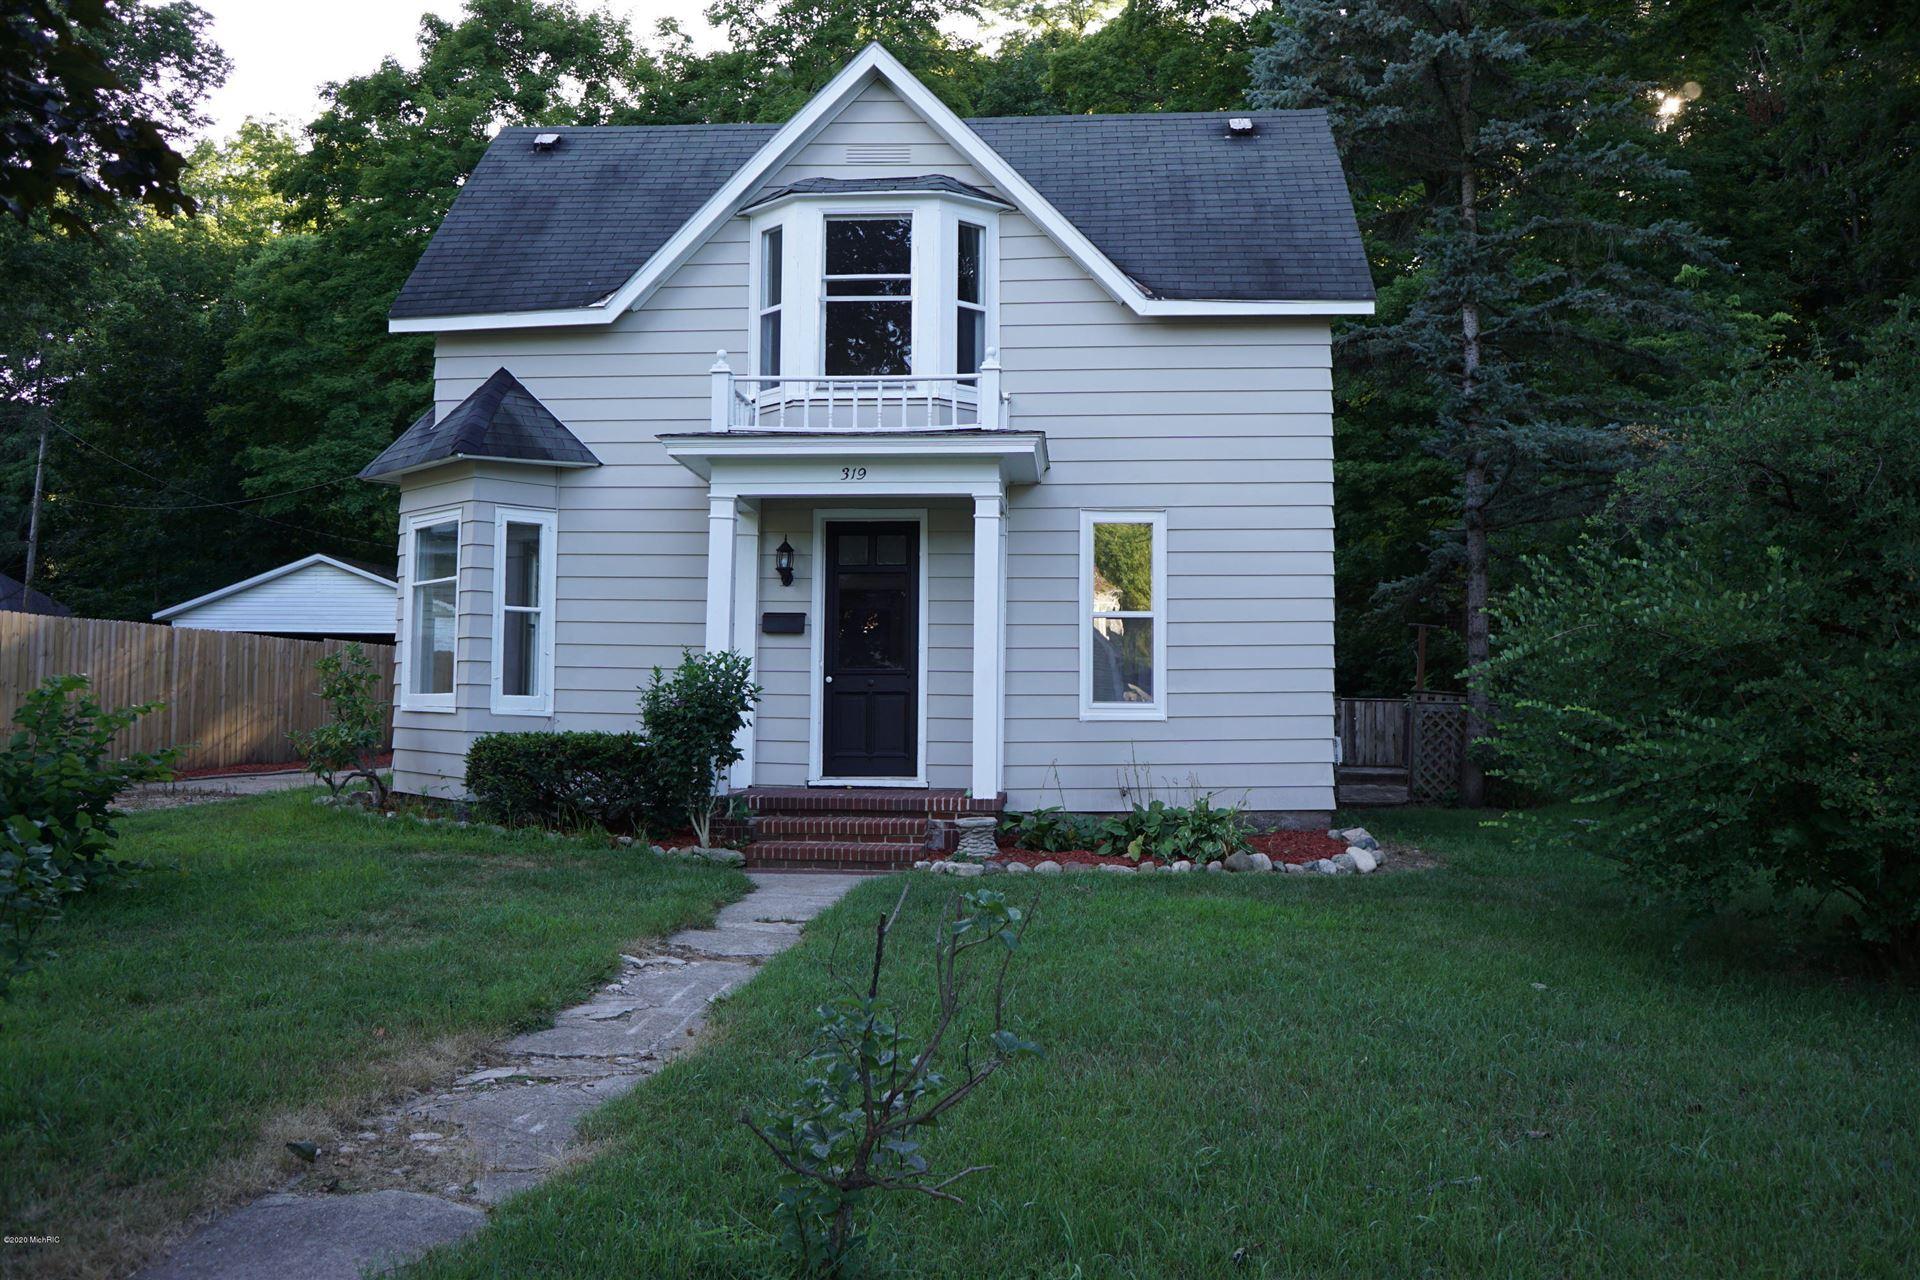 319 Pine Street, Allegan, MI 49010 - MLS#: 20032894